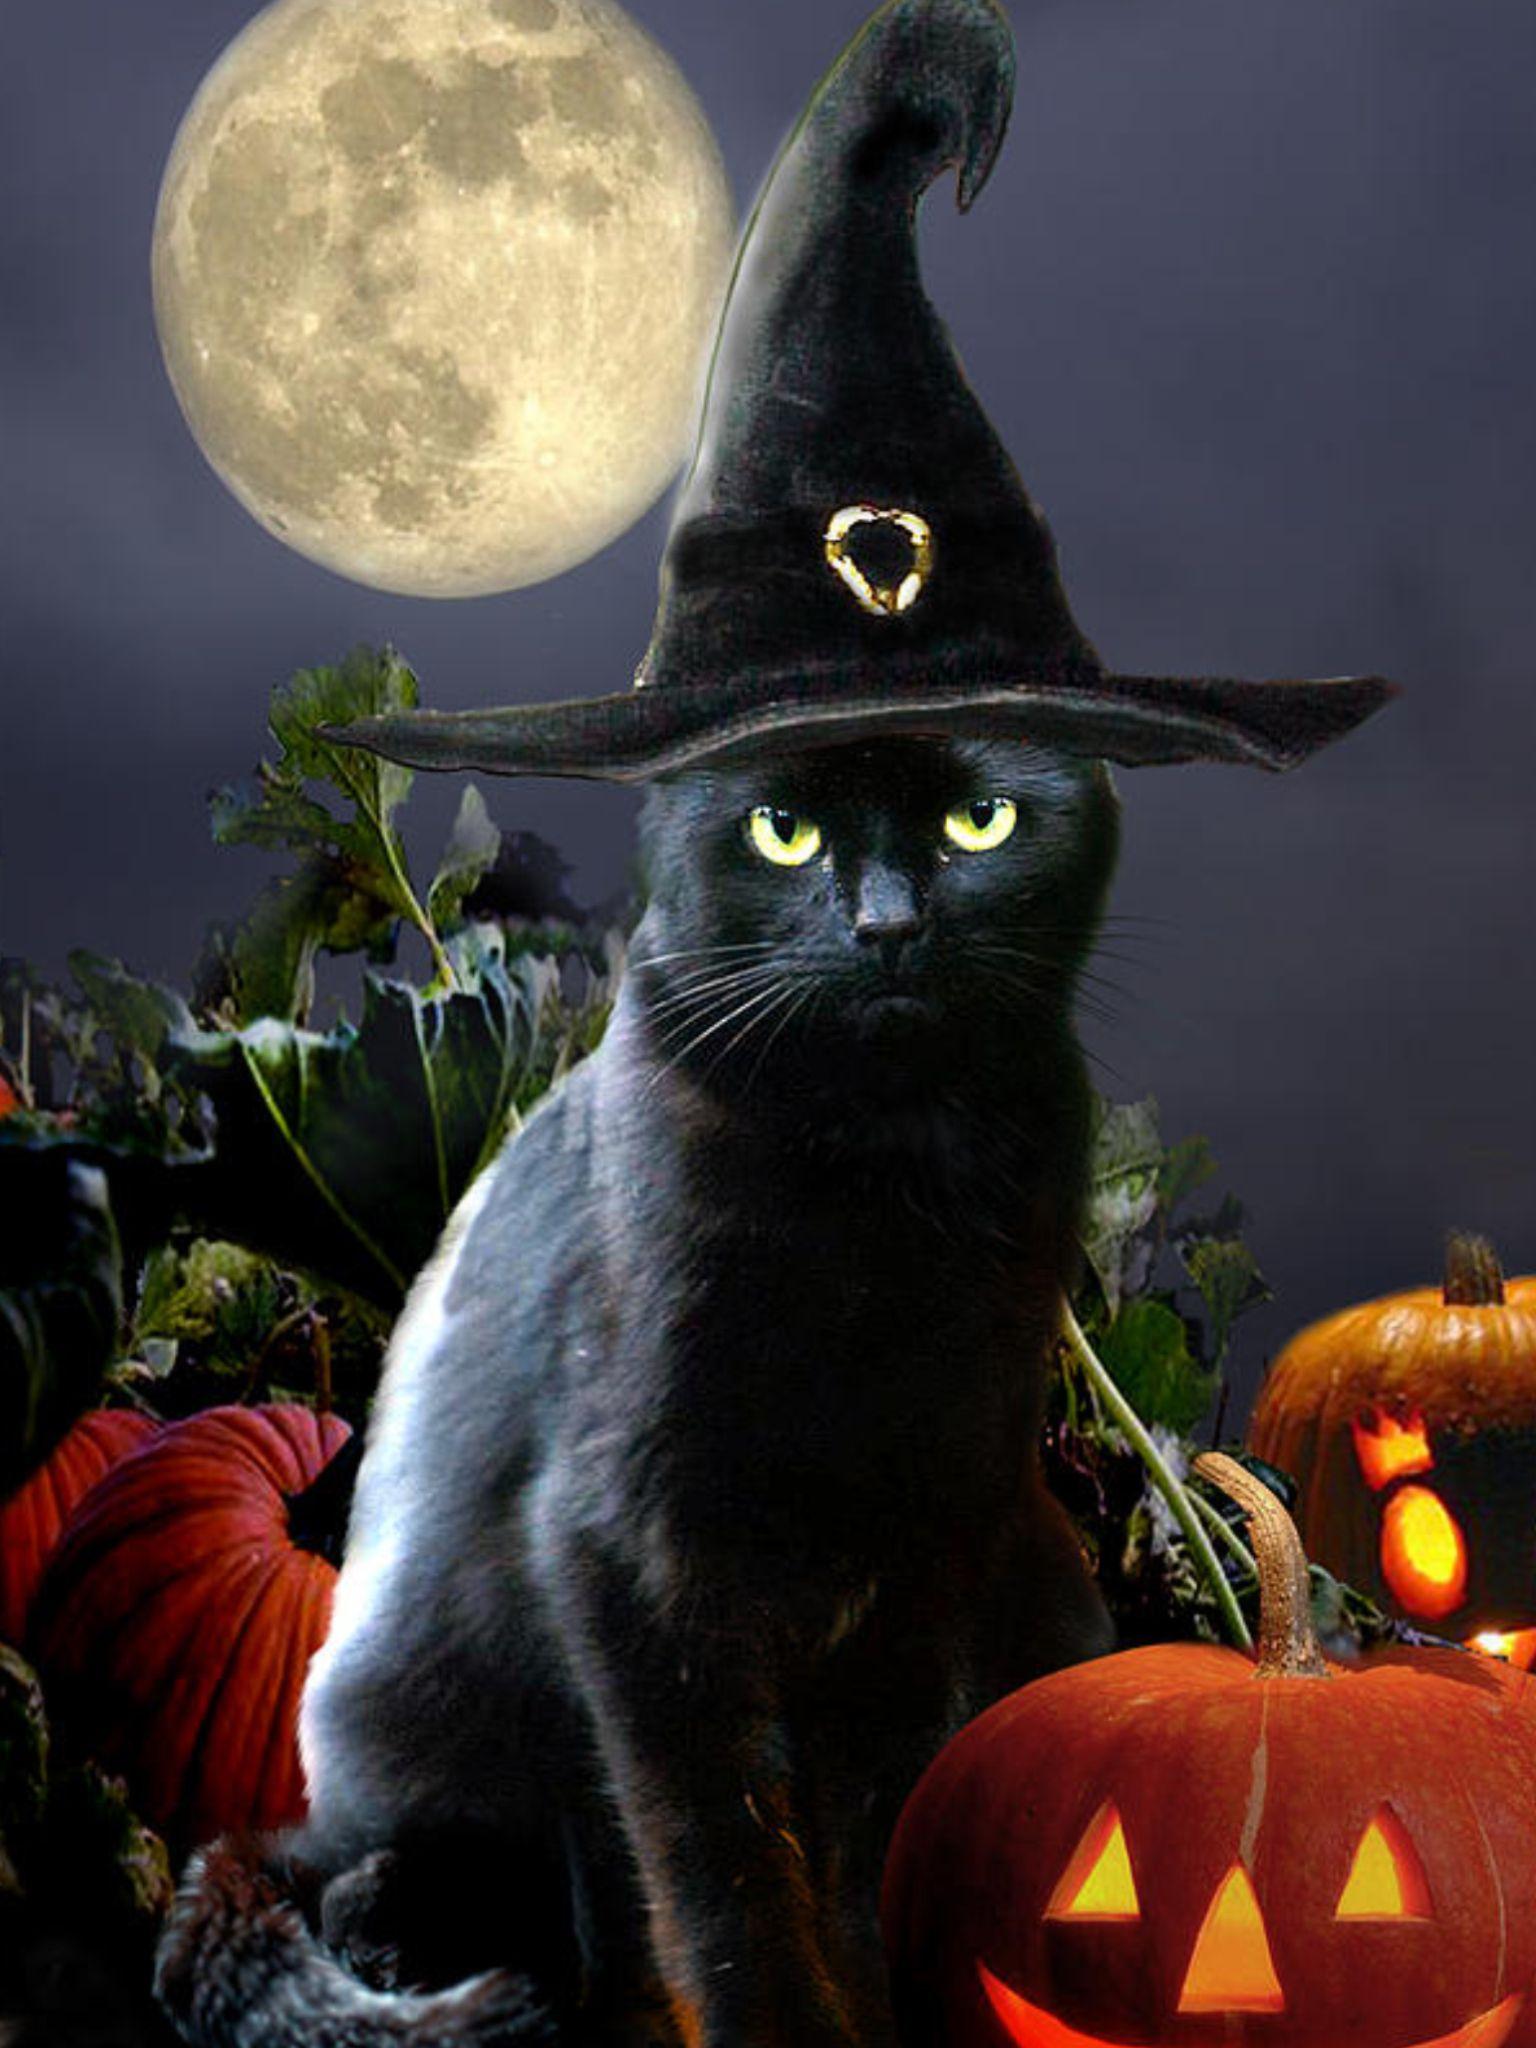 Halloween, All Hallows Eve, Trick or Treat, Black Cat, Bat ...